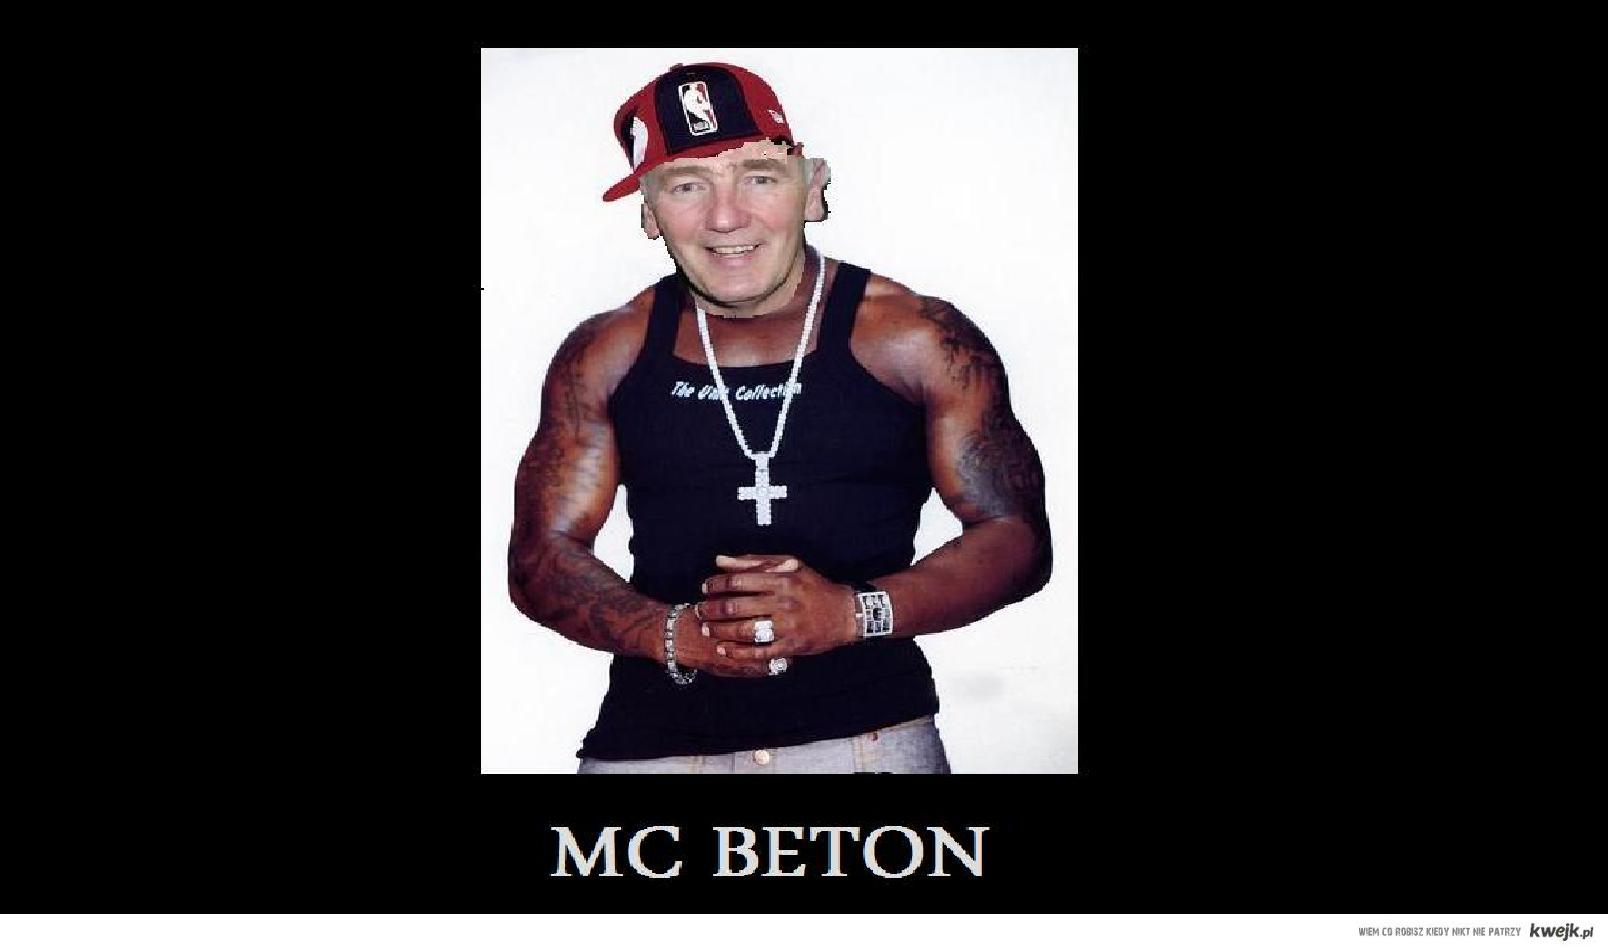 Mc Beton